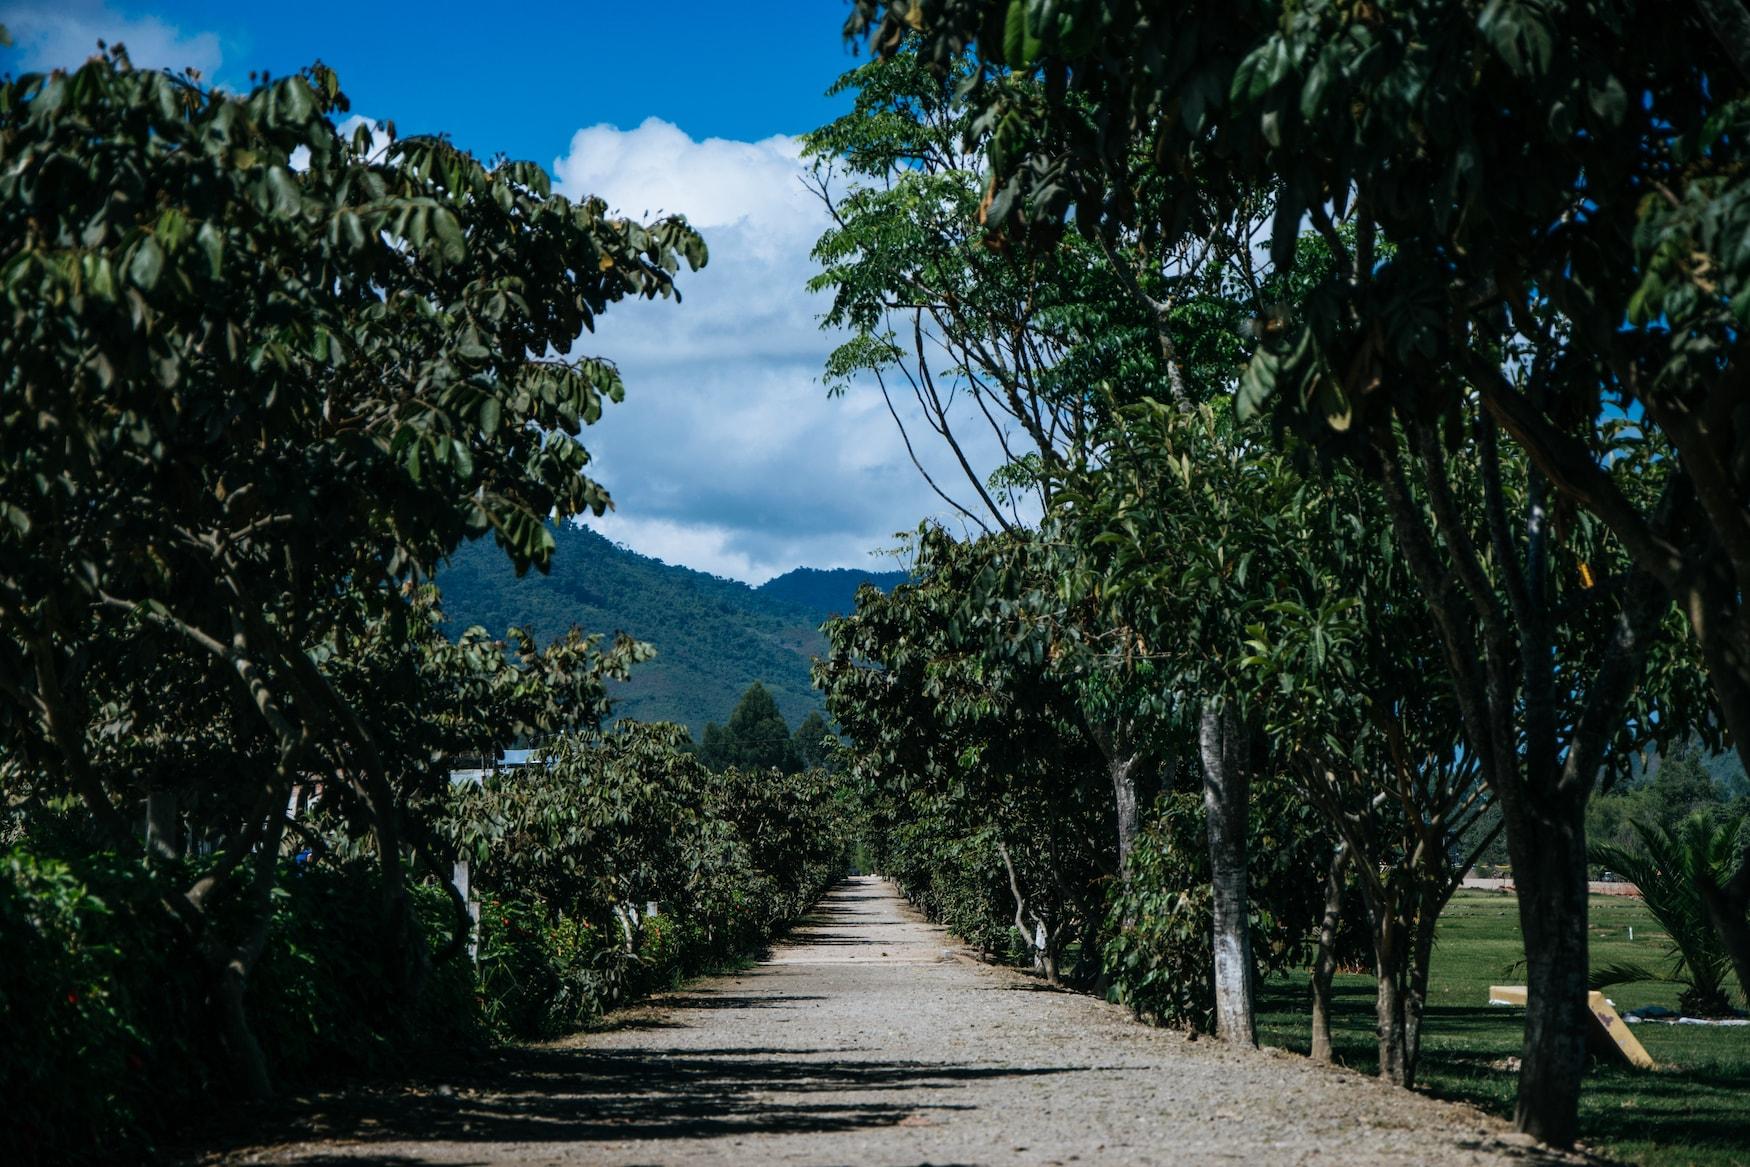 Urlaub mit dem Fahrrad im Amazonas in Peru